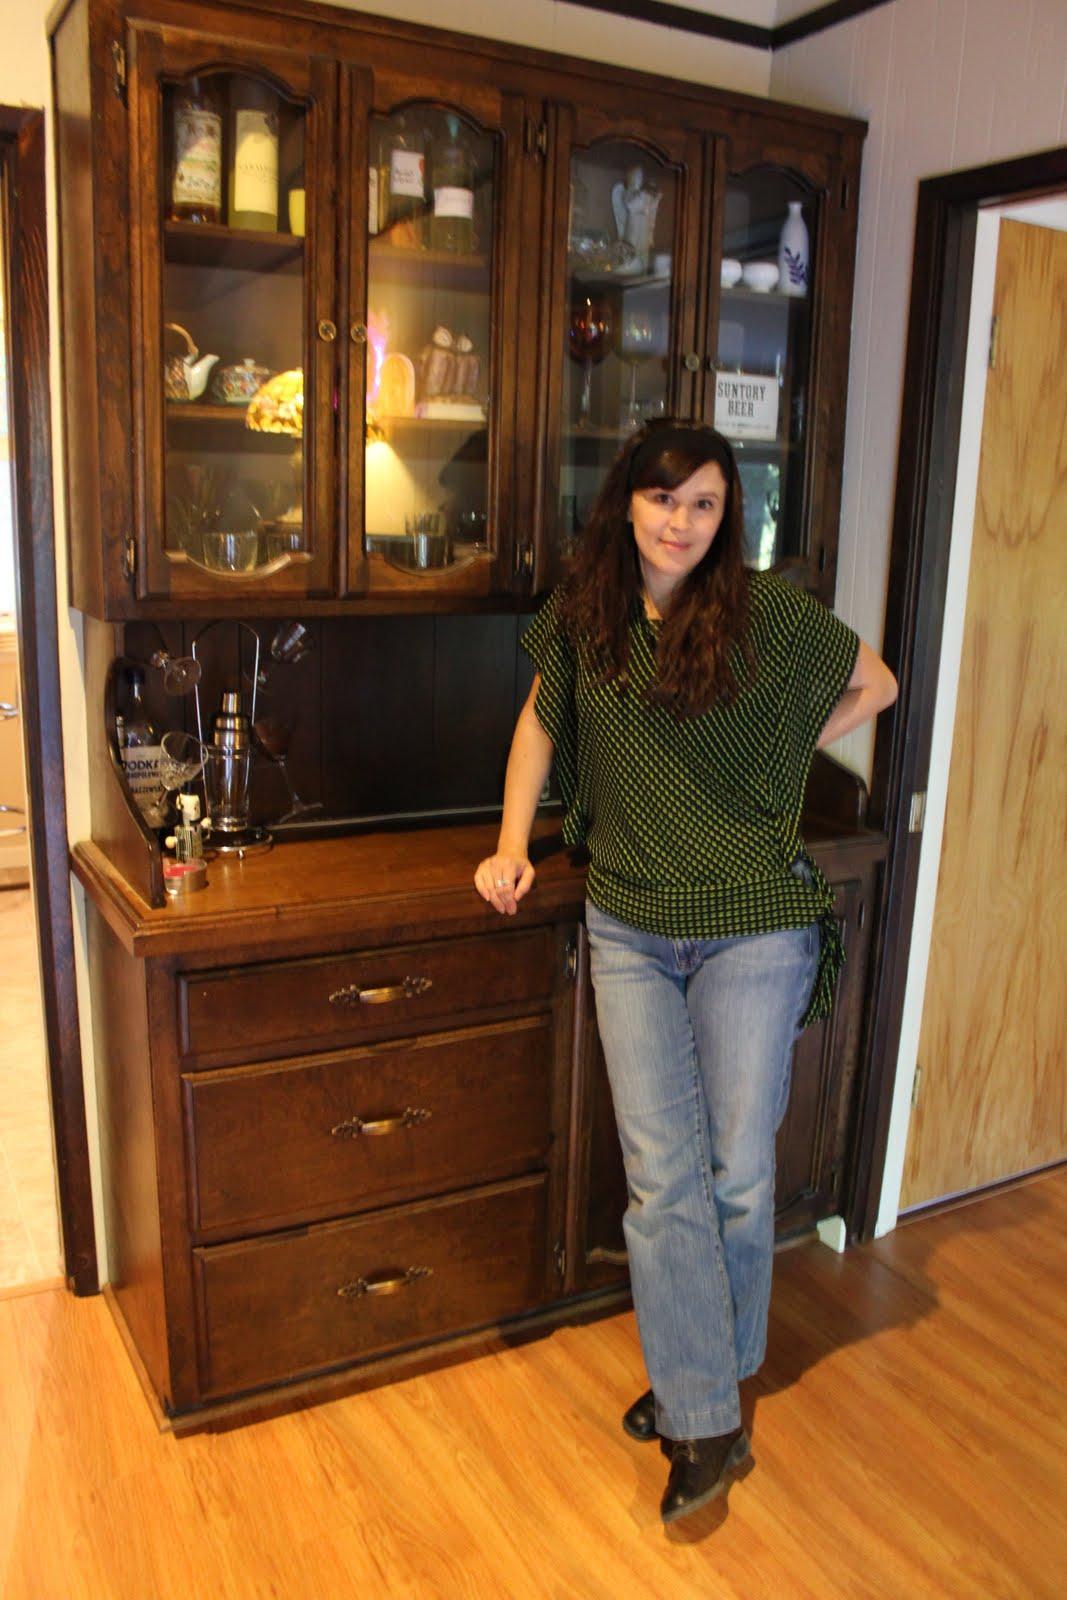 Amazing Build Liquor Cabinet Plans WoodWorking Projects Amp Plans